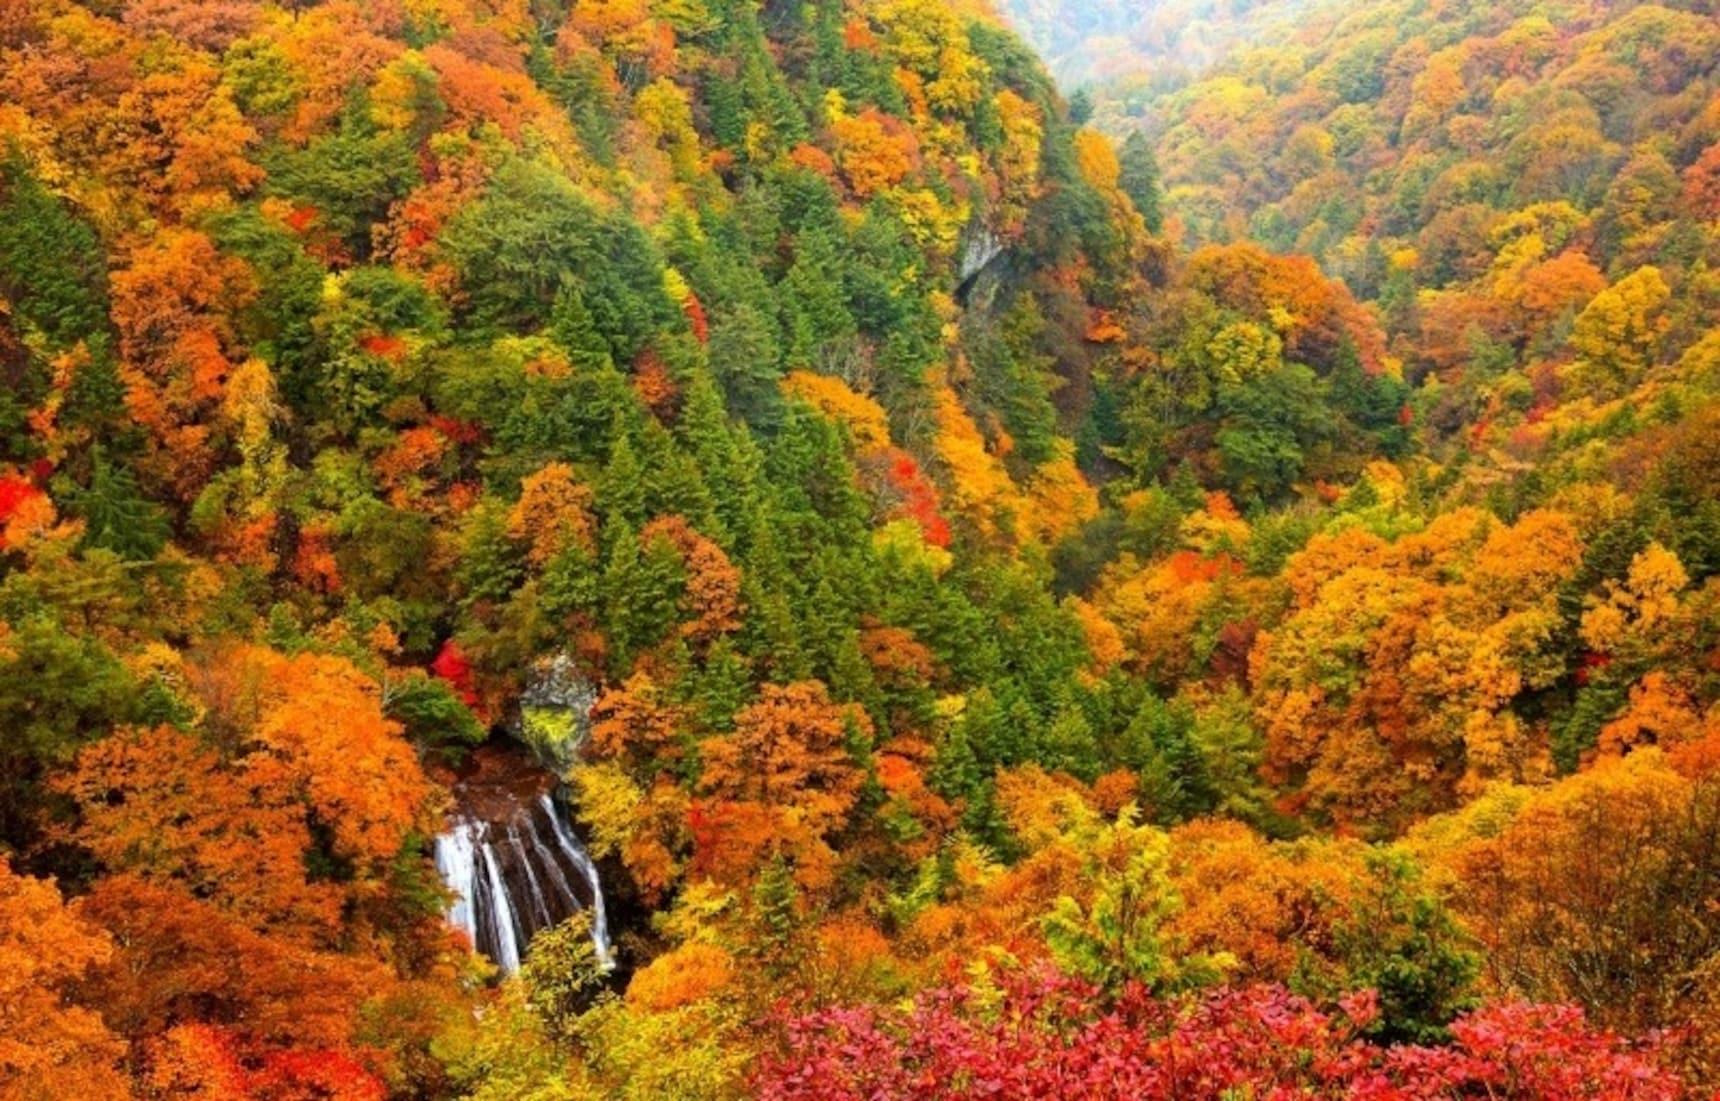 The Top 5 Fall Color Spots in Koshinetsu